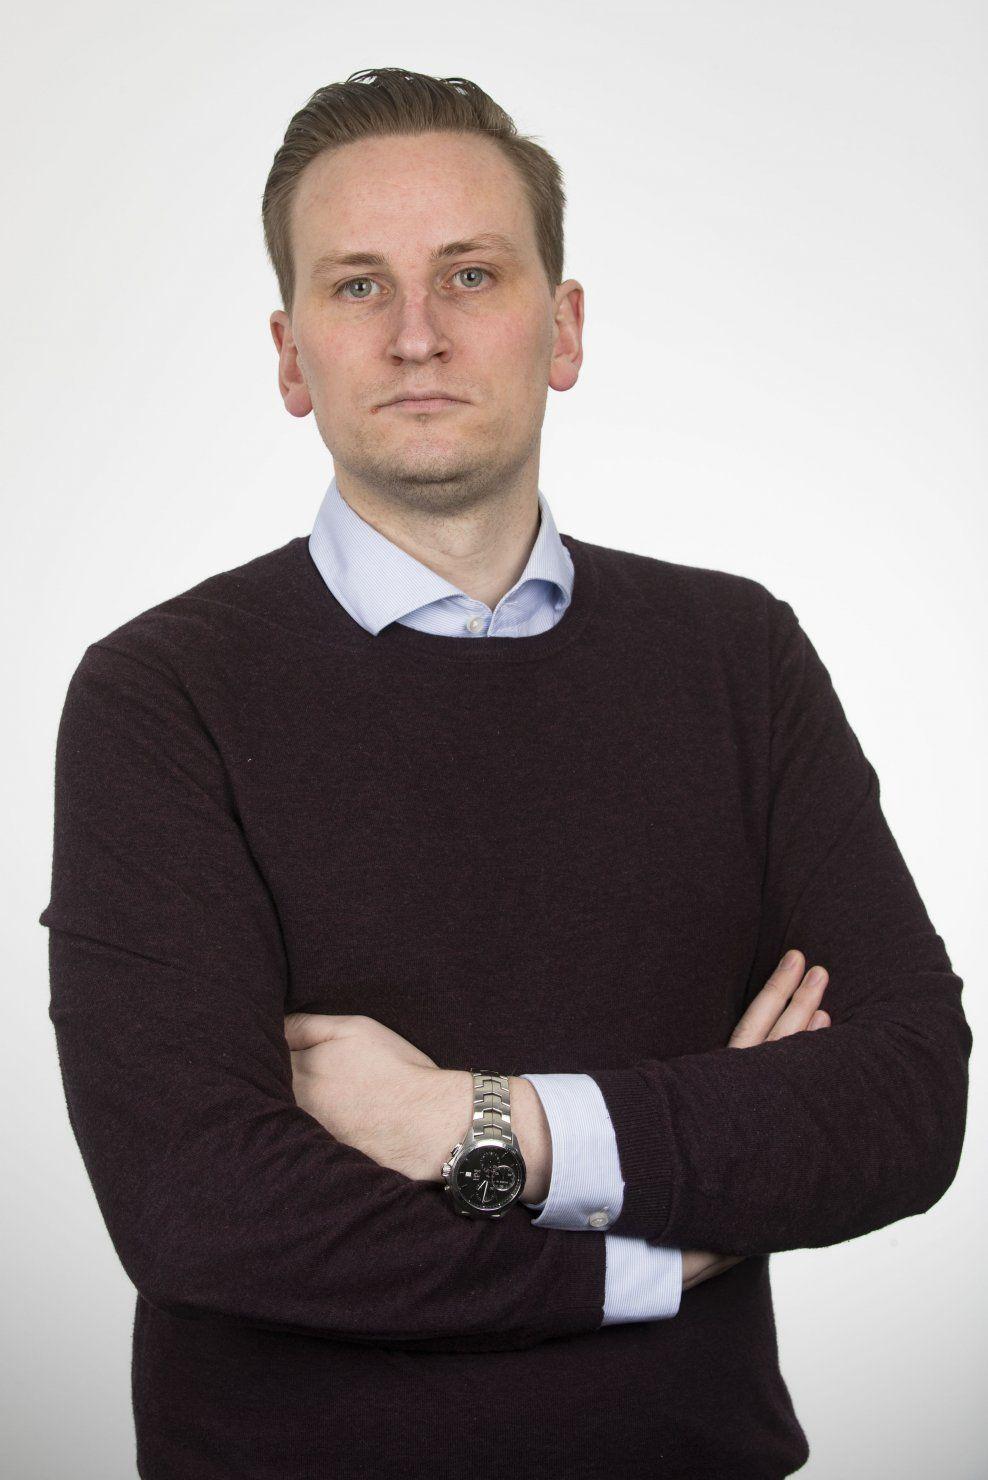 Øyvind Herrebrøden, VG